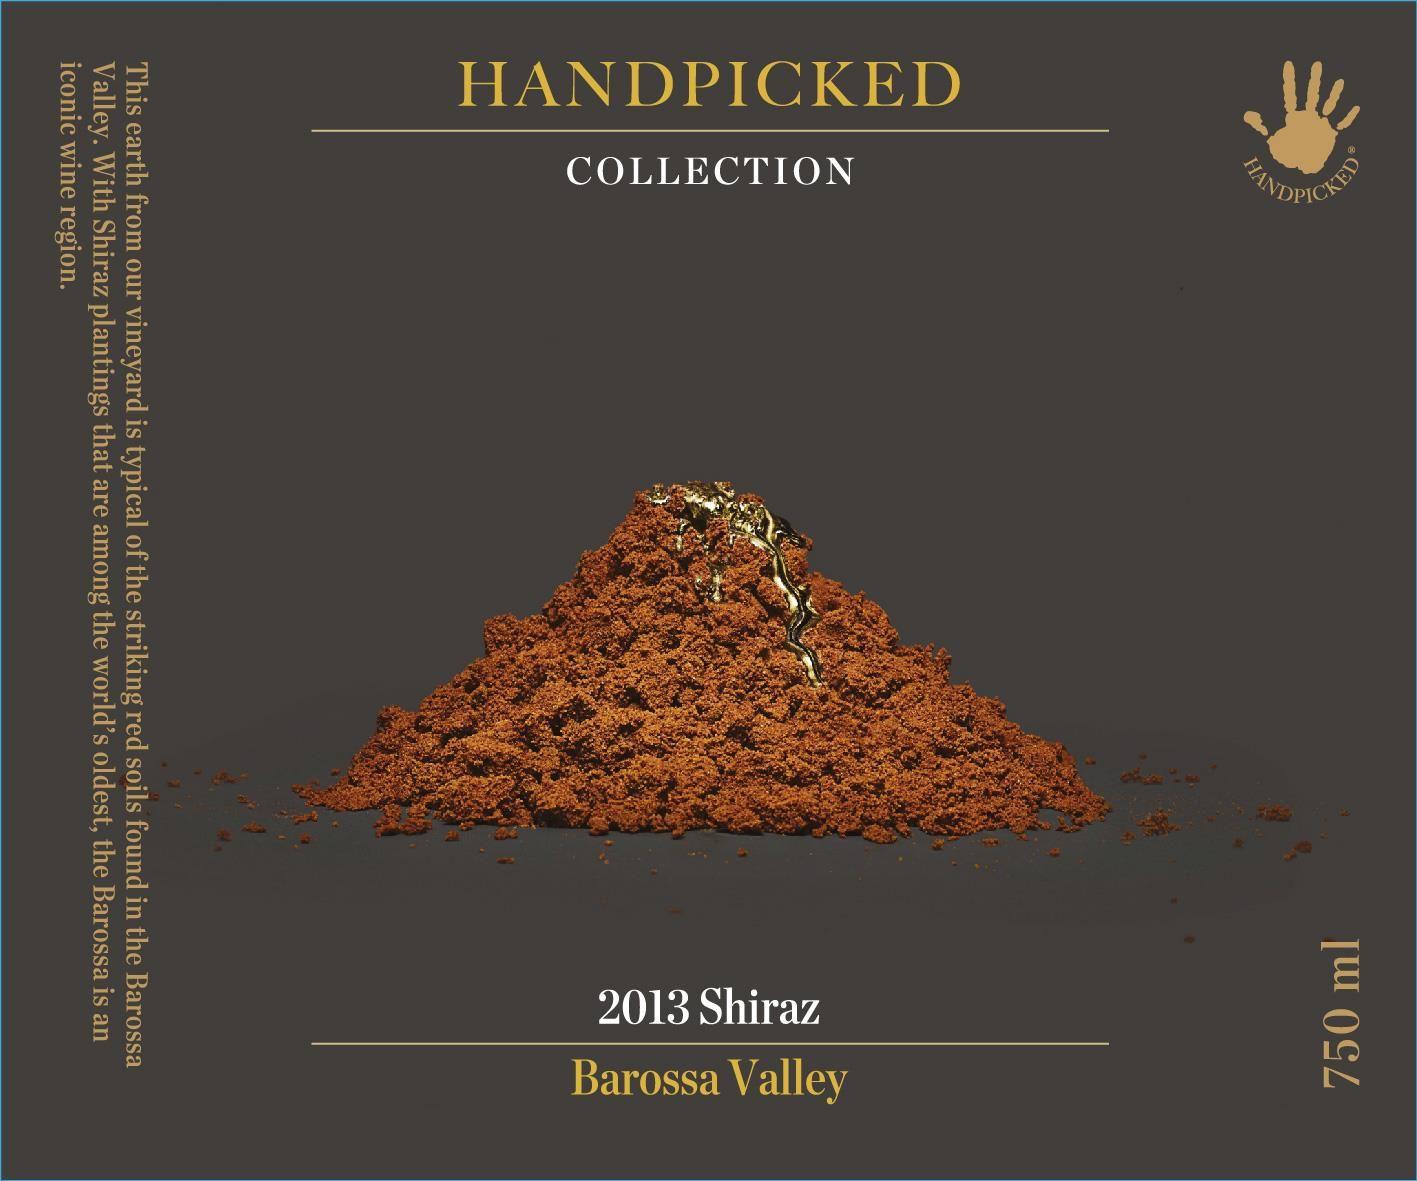 Handpicked Wines Collection Barossa Valley Shiraz 2013